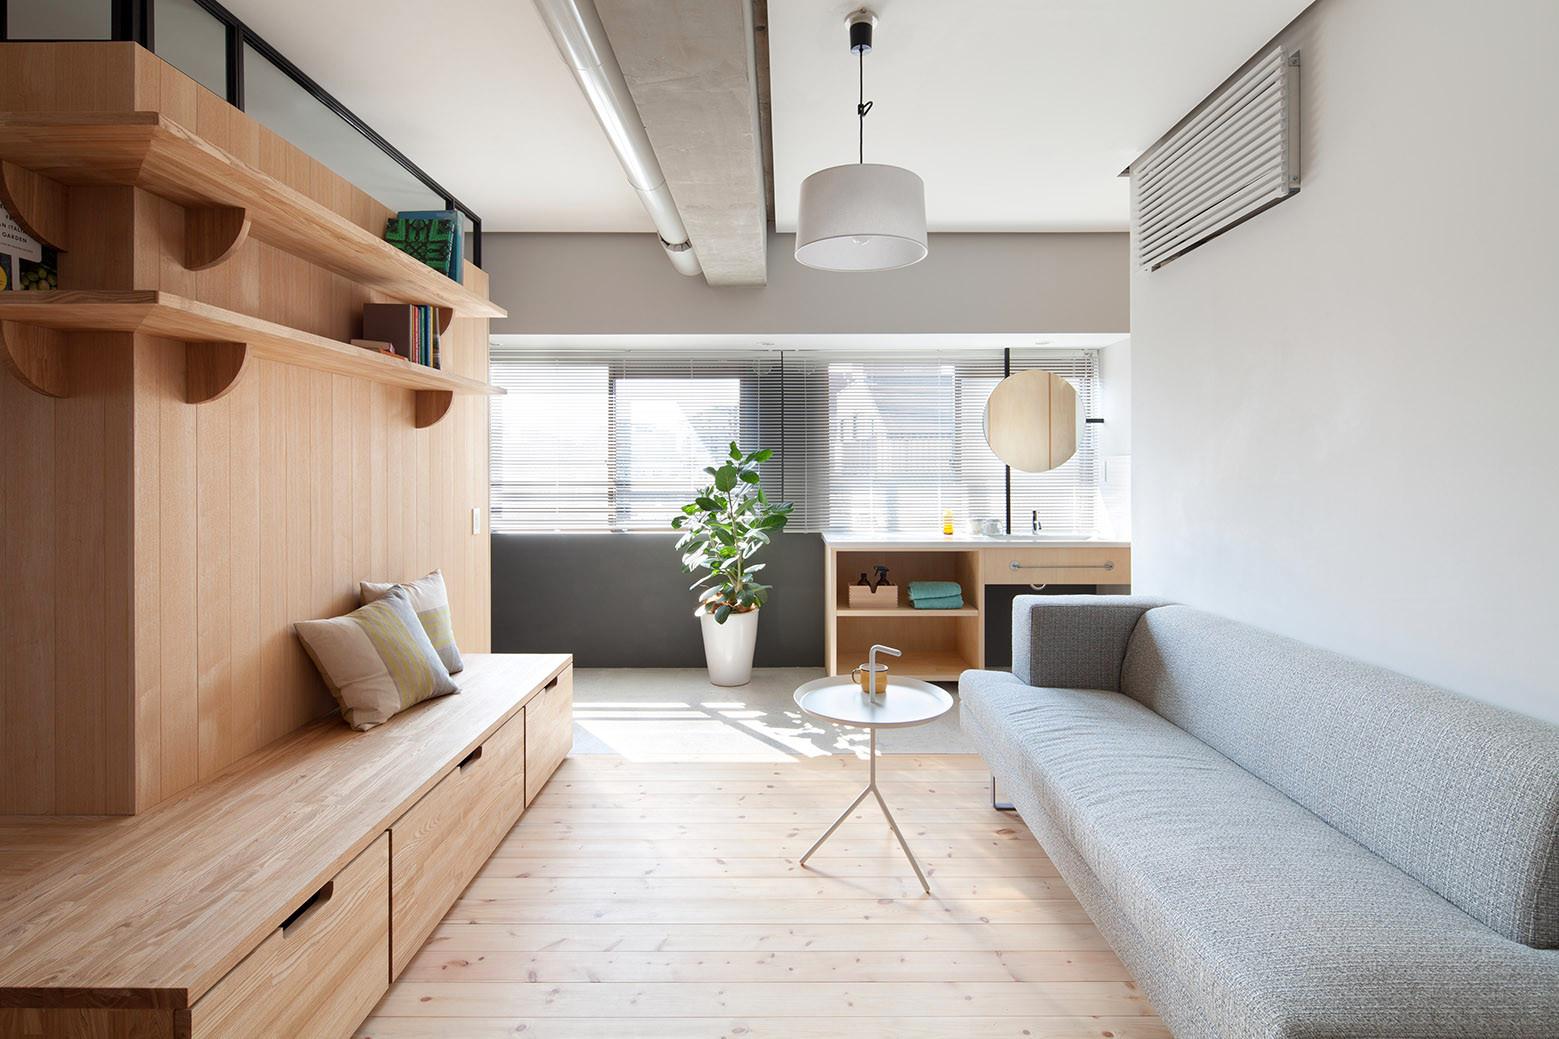 дървена преграда загражда две спални - 2